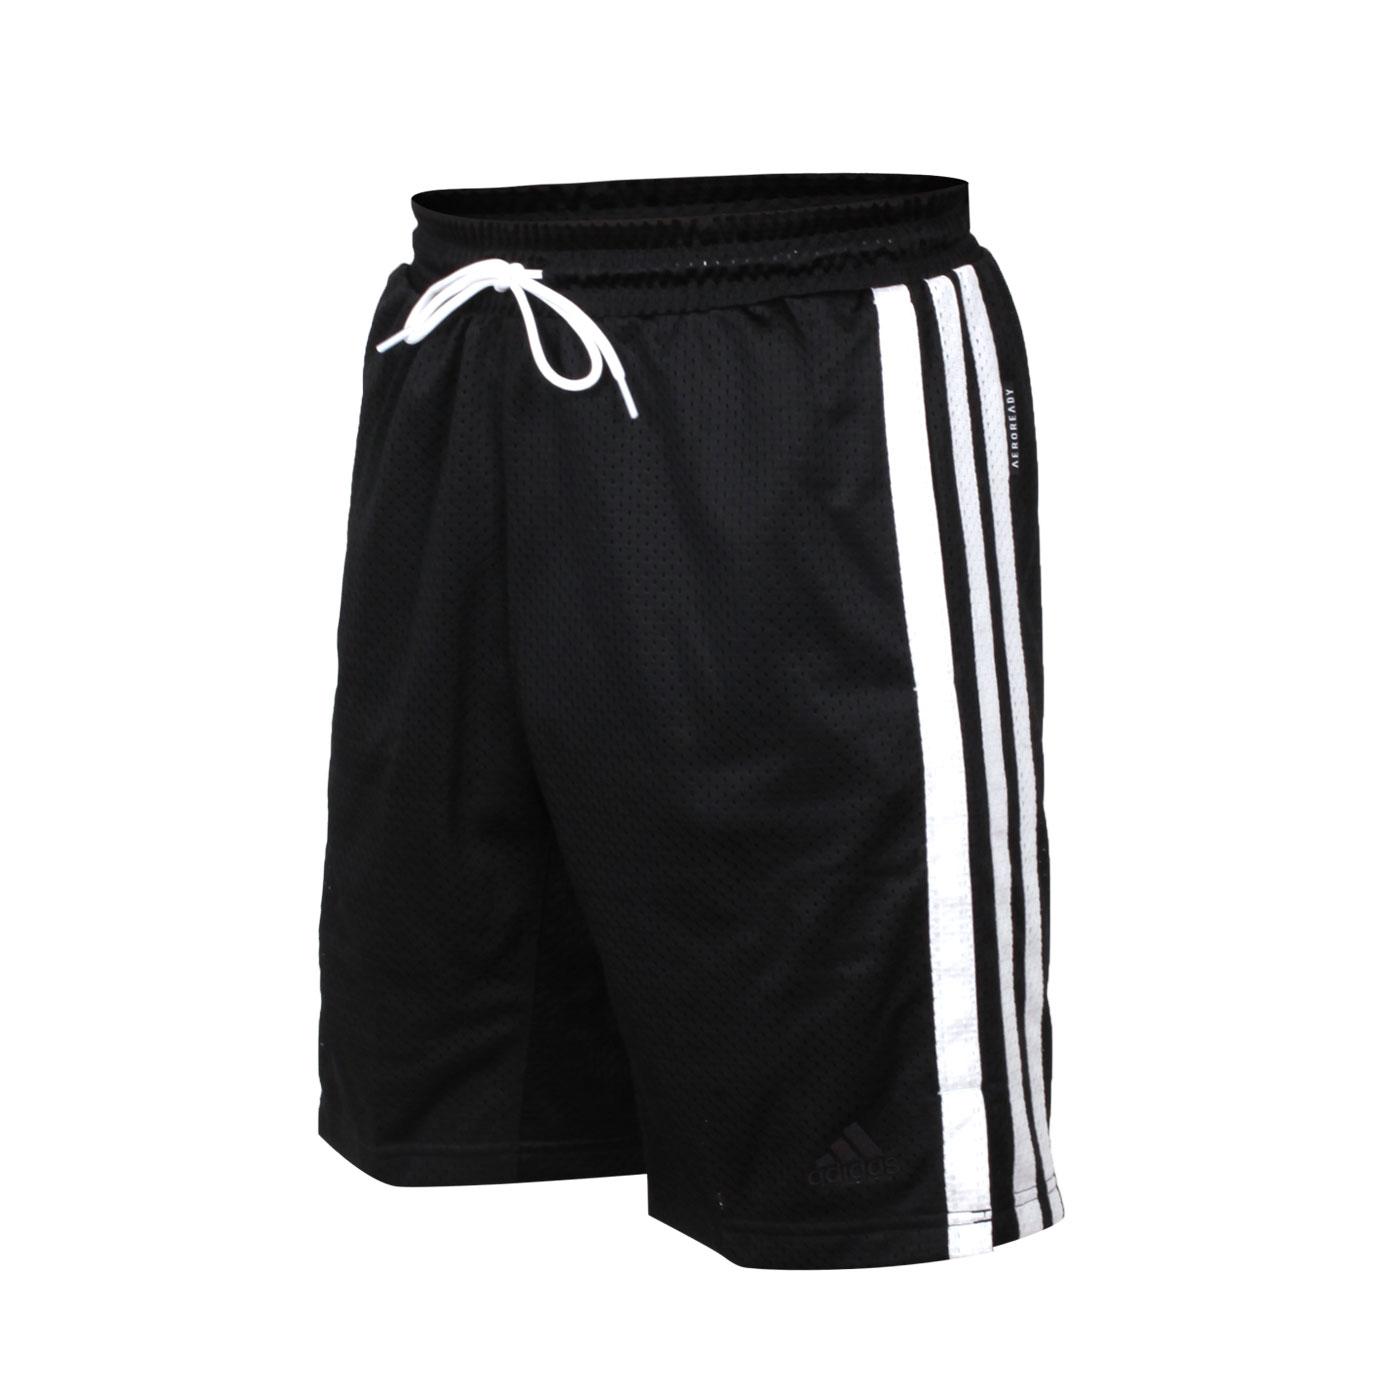 ADIDAS 男款運動短褲 GK8382